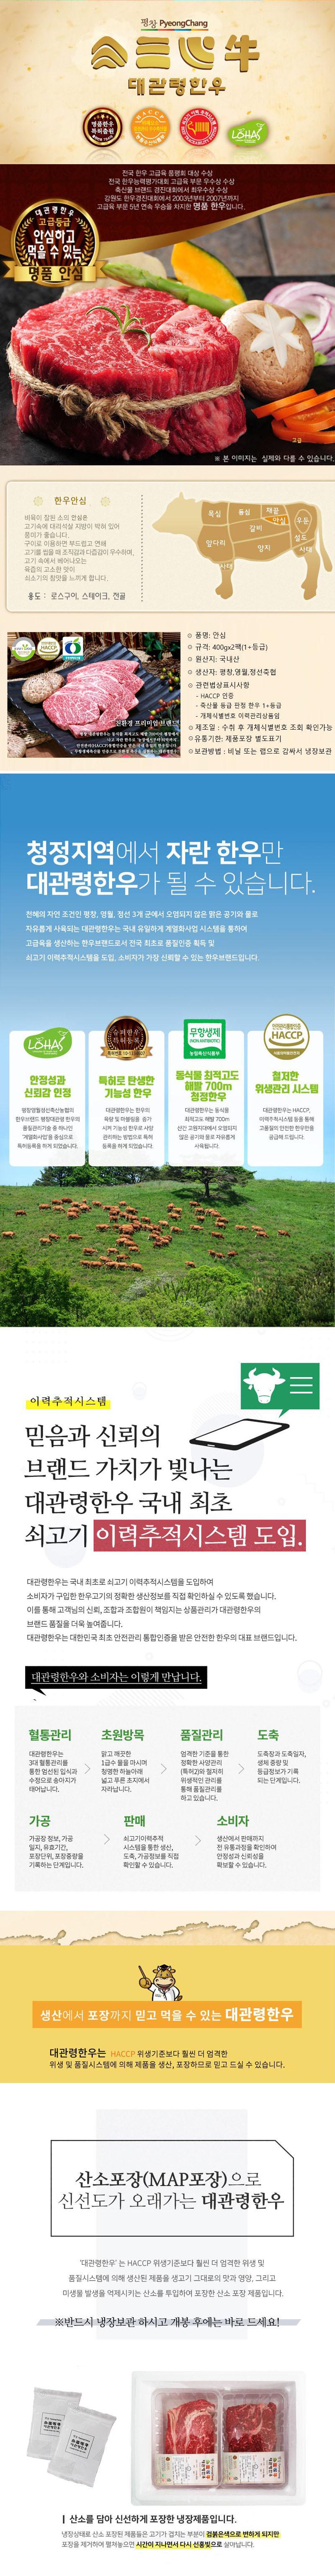 daekwoanlyenghanwoo_sang_ansim400gx2_1+.jpg